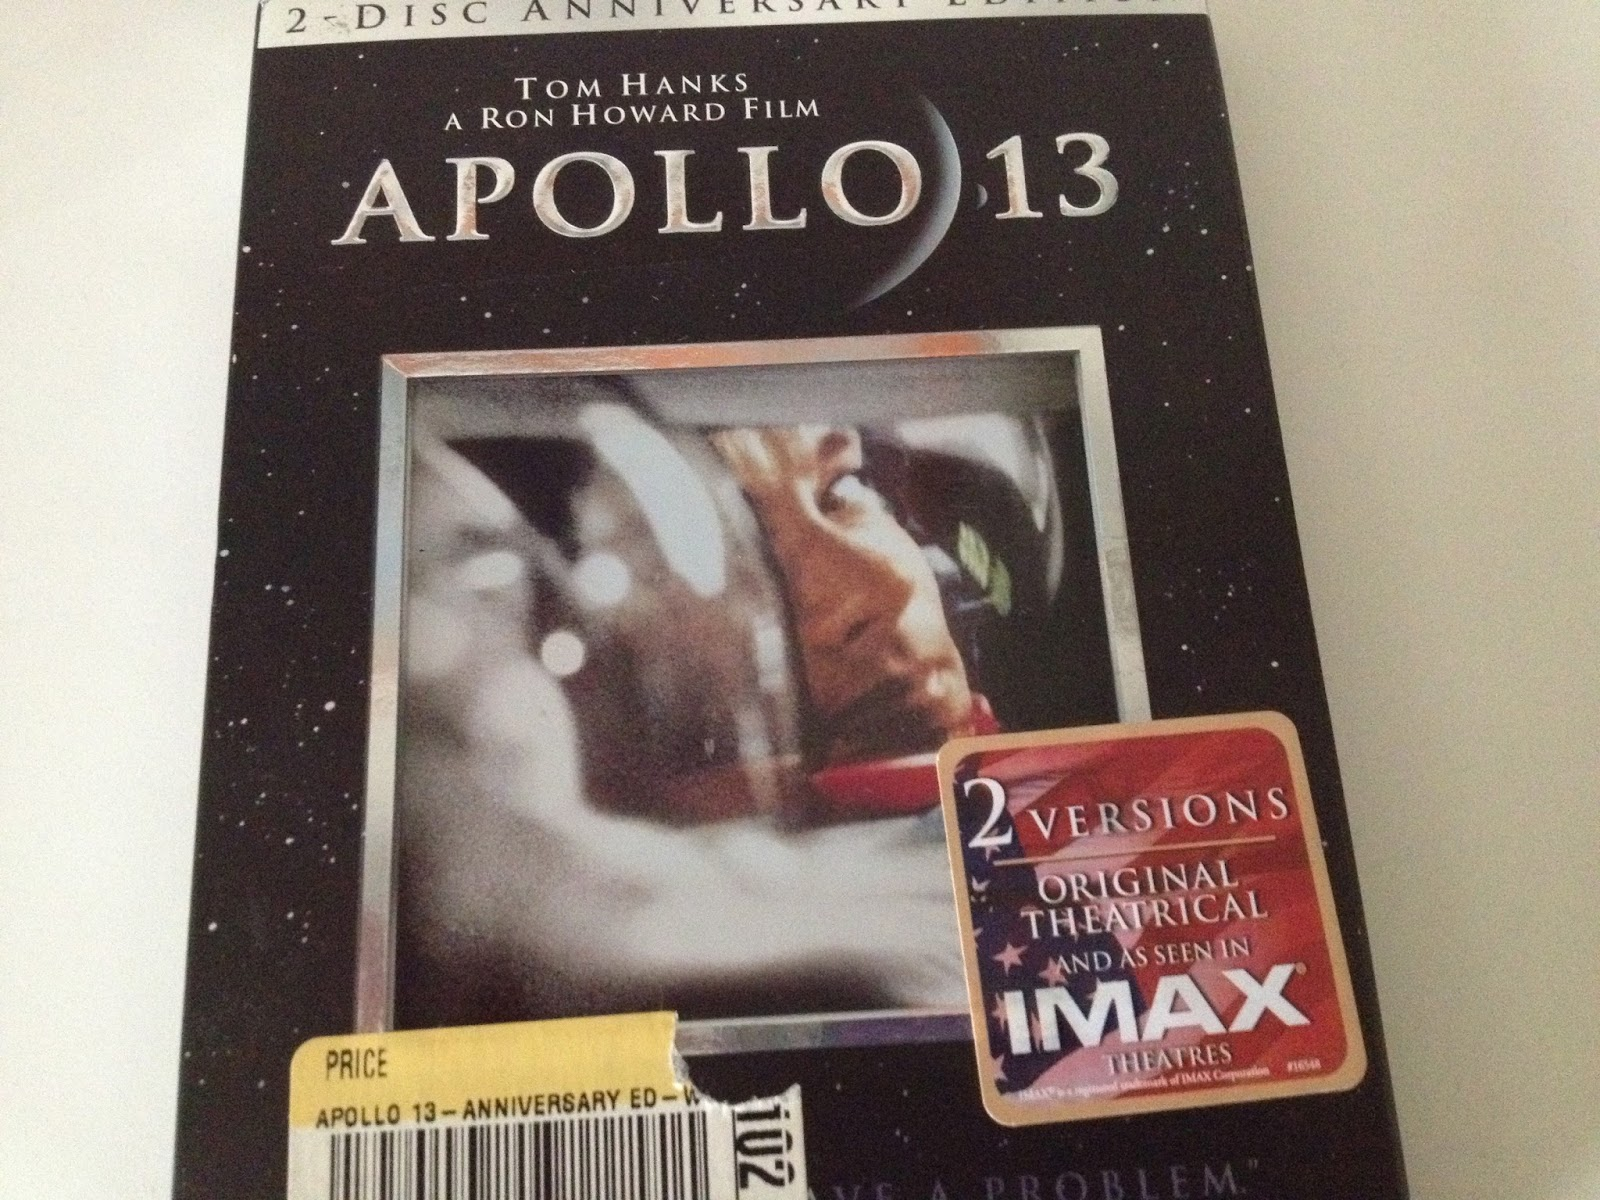 lost moon vs apollo 13 essay Apollo 13: failure is not an option abstract when apollo of landing are on the moon are lost com/essays/apollo-13-failure-is-not-an-option/29923.